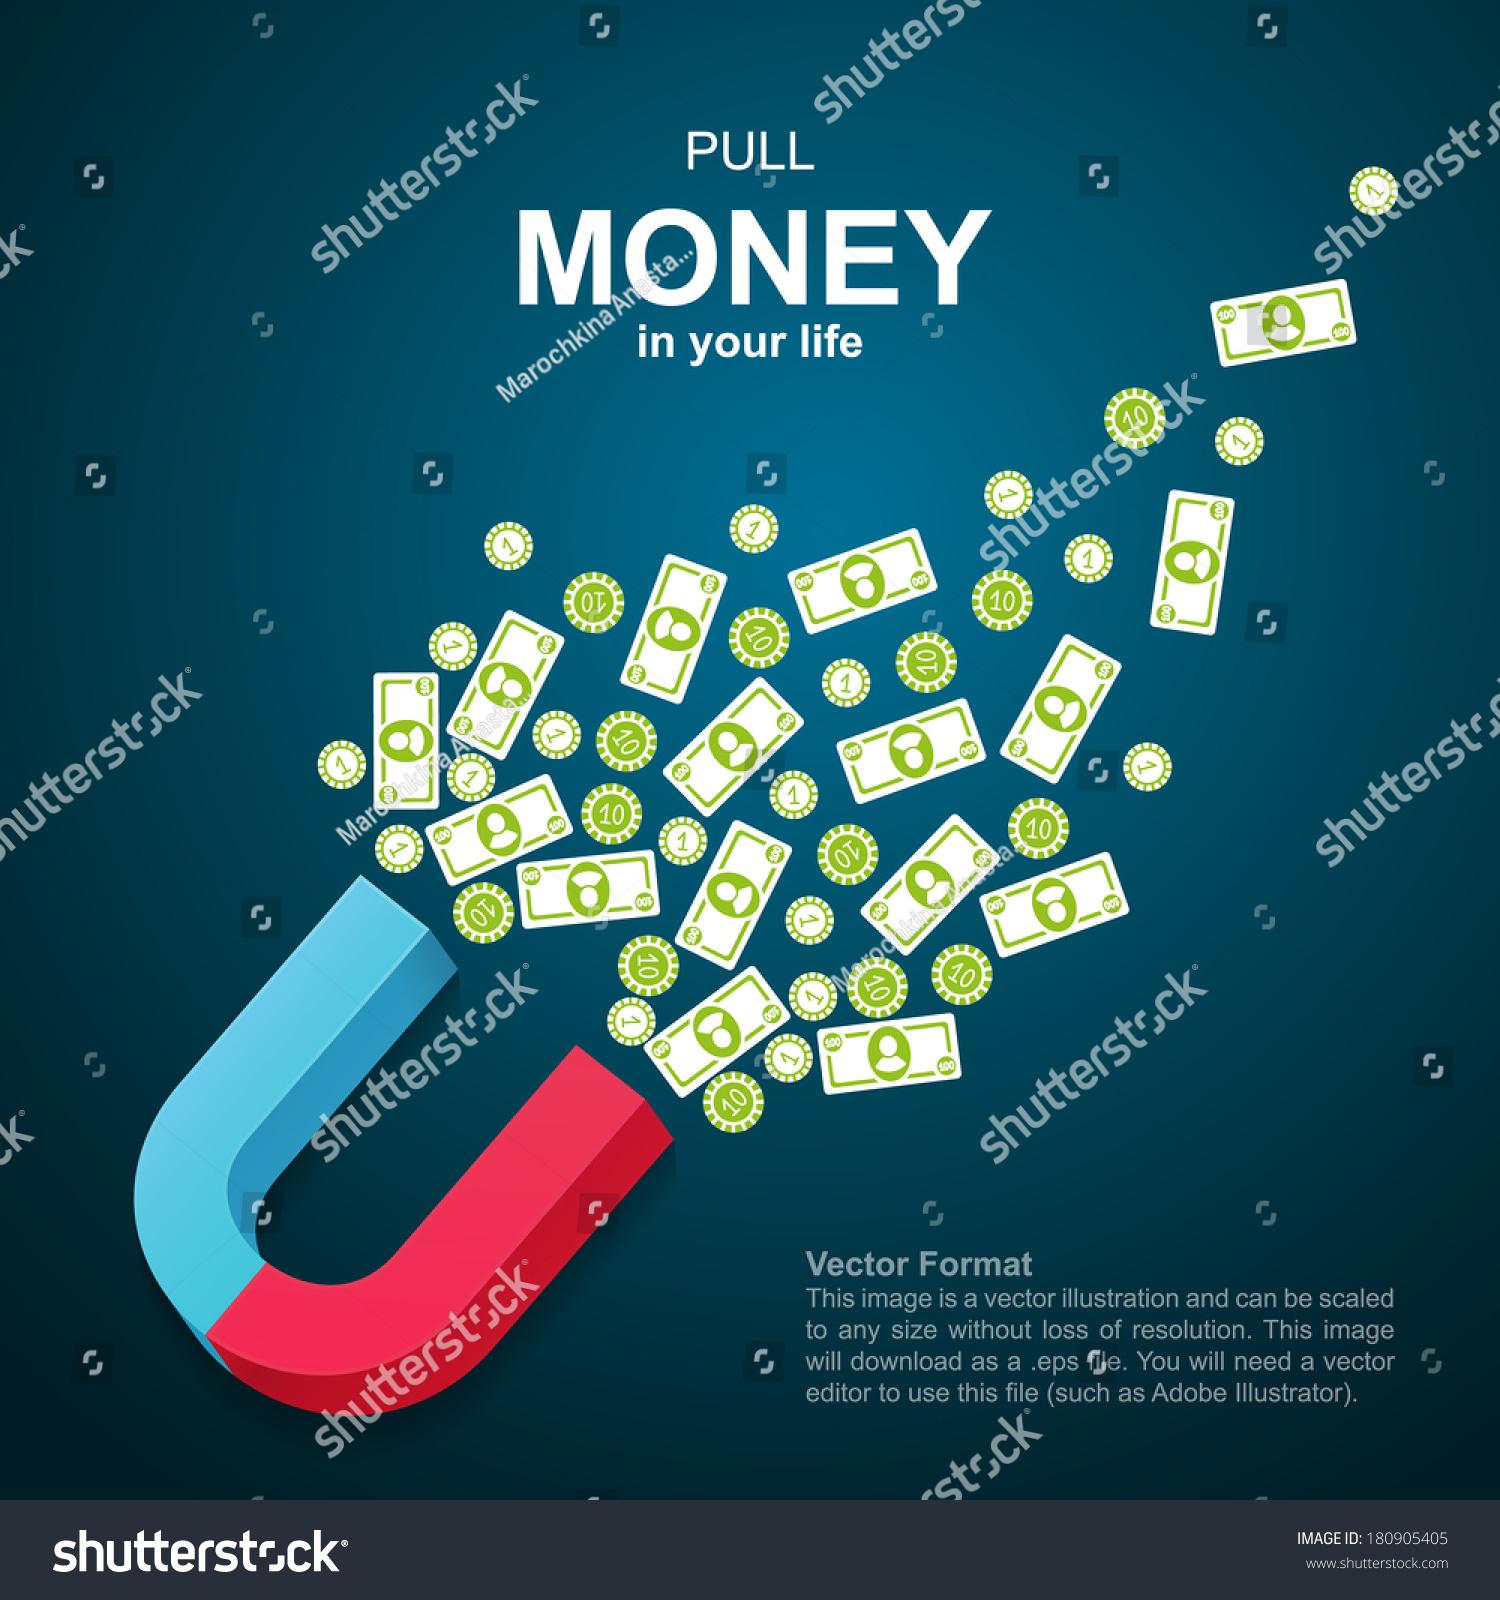 Finance Background: Financial Background Money Magnet Pulling Money Stock